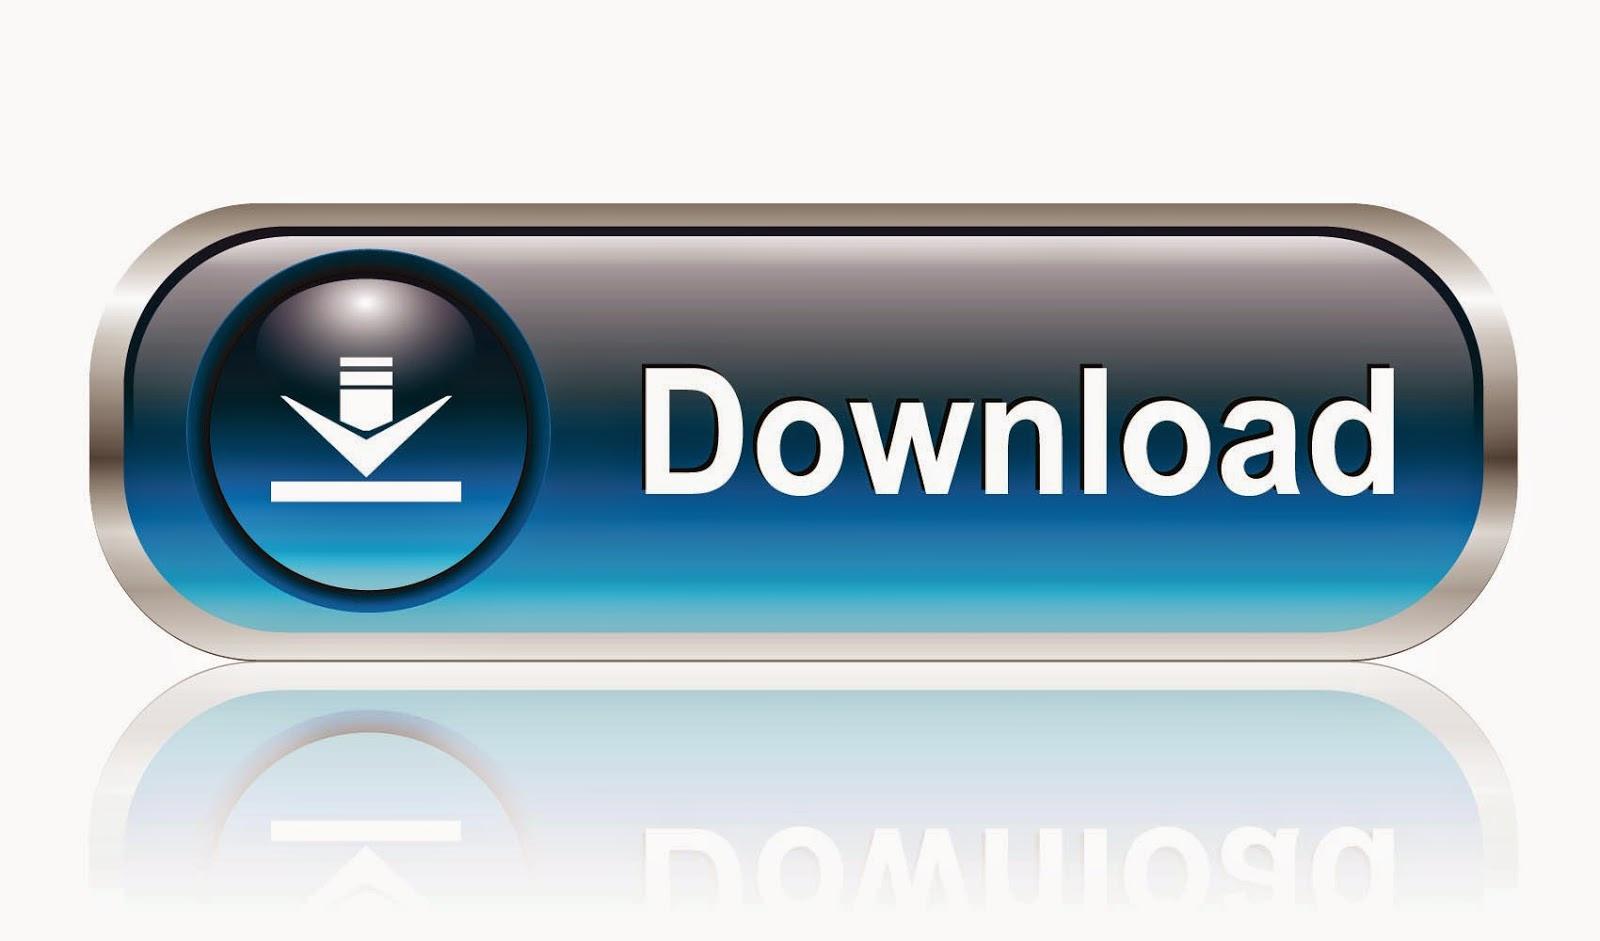 "<img src=""http://1.bp.blogspot.com/-kePAm4TXsQU/U07vujT2xAI/AAAAAAAACT4/yYGYah6mvI8/s1600/pc-image-editor-5.5.jpg"" alt=""PC Image Editor 5.5 Free Download"" />"